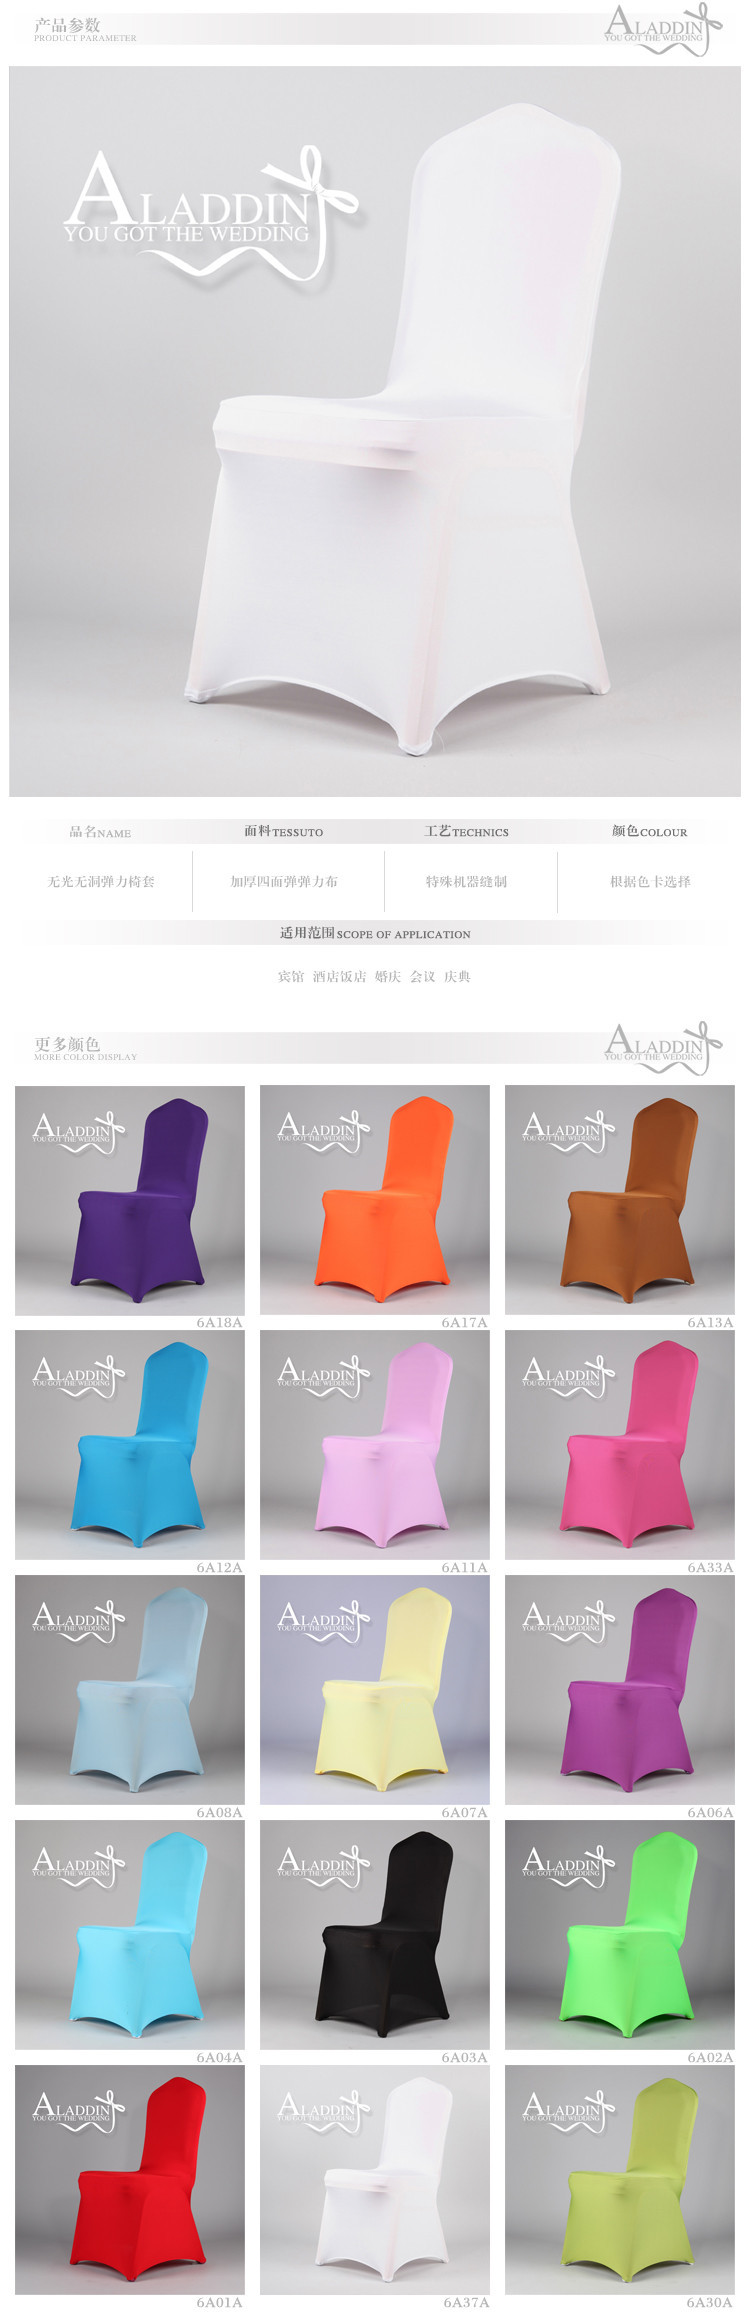 Накидка на стул Aladdin S & V Banquet Weddingel Aladdin-2